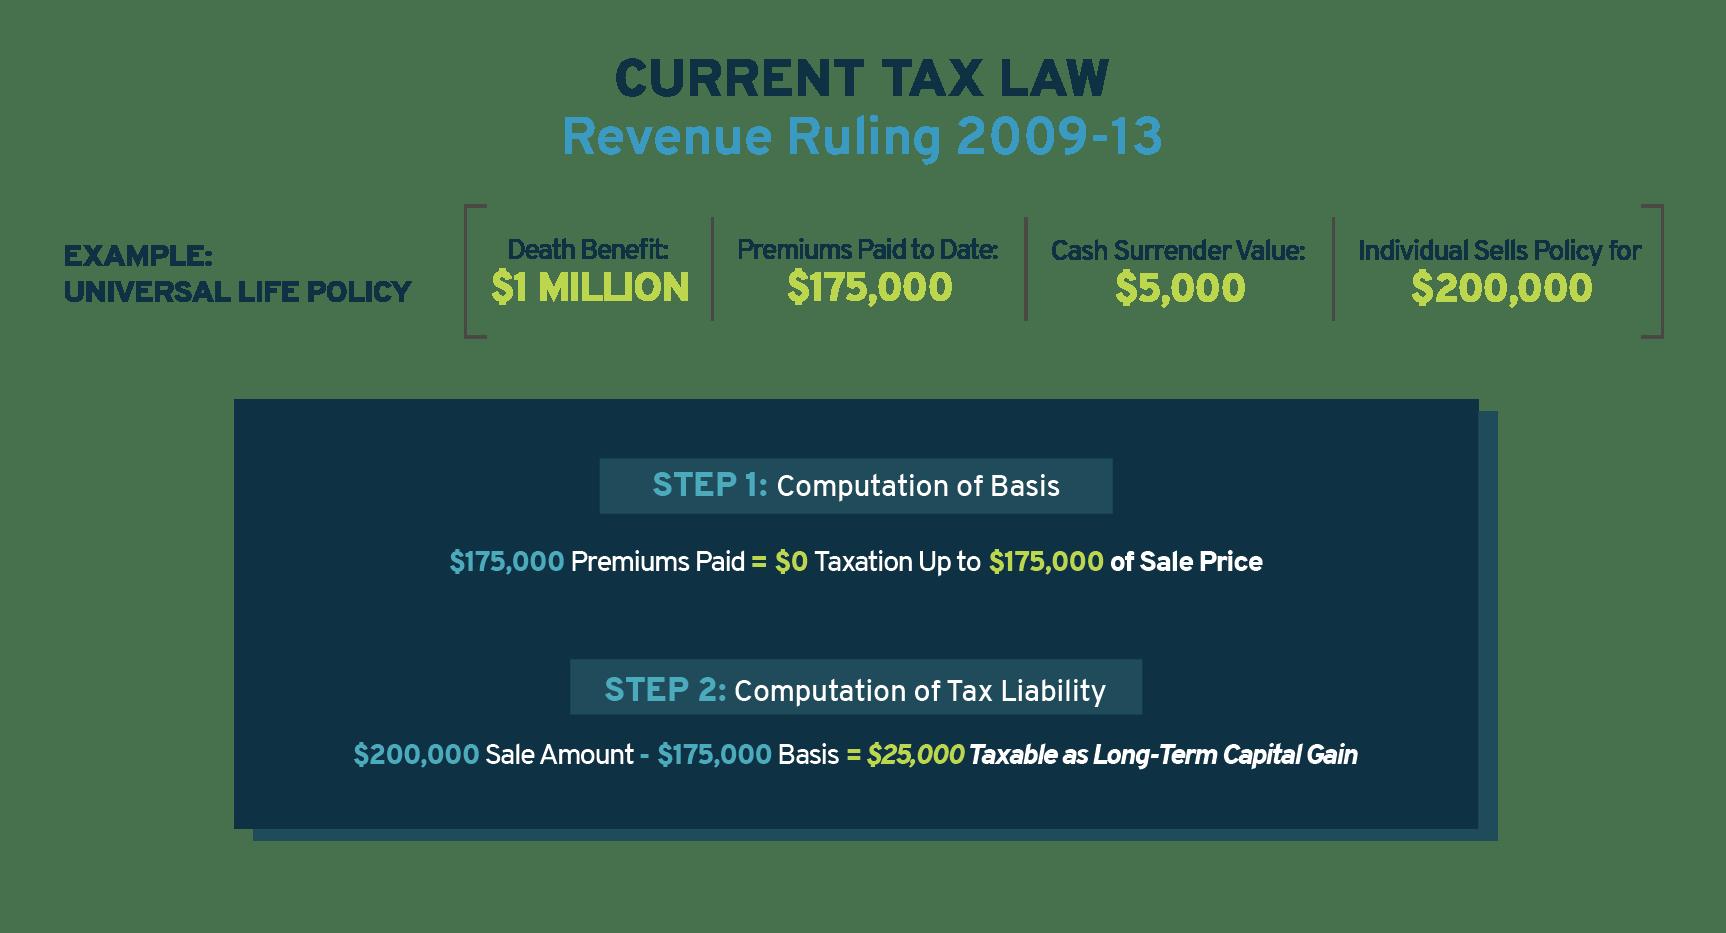 Current Tax Law